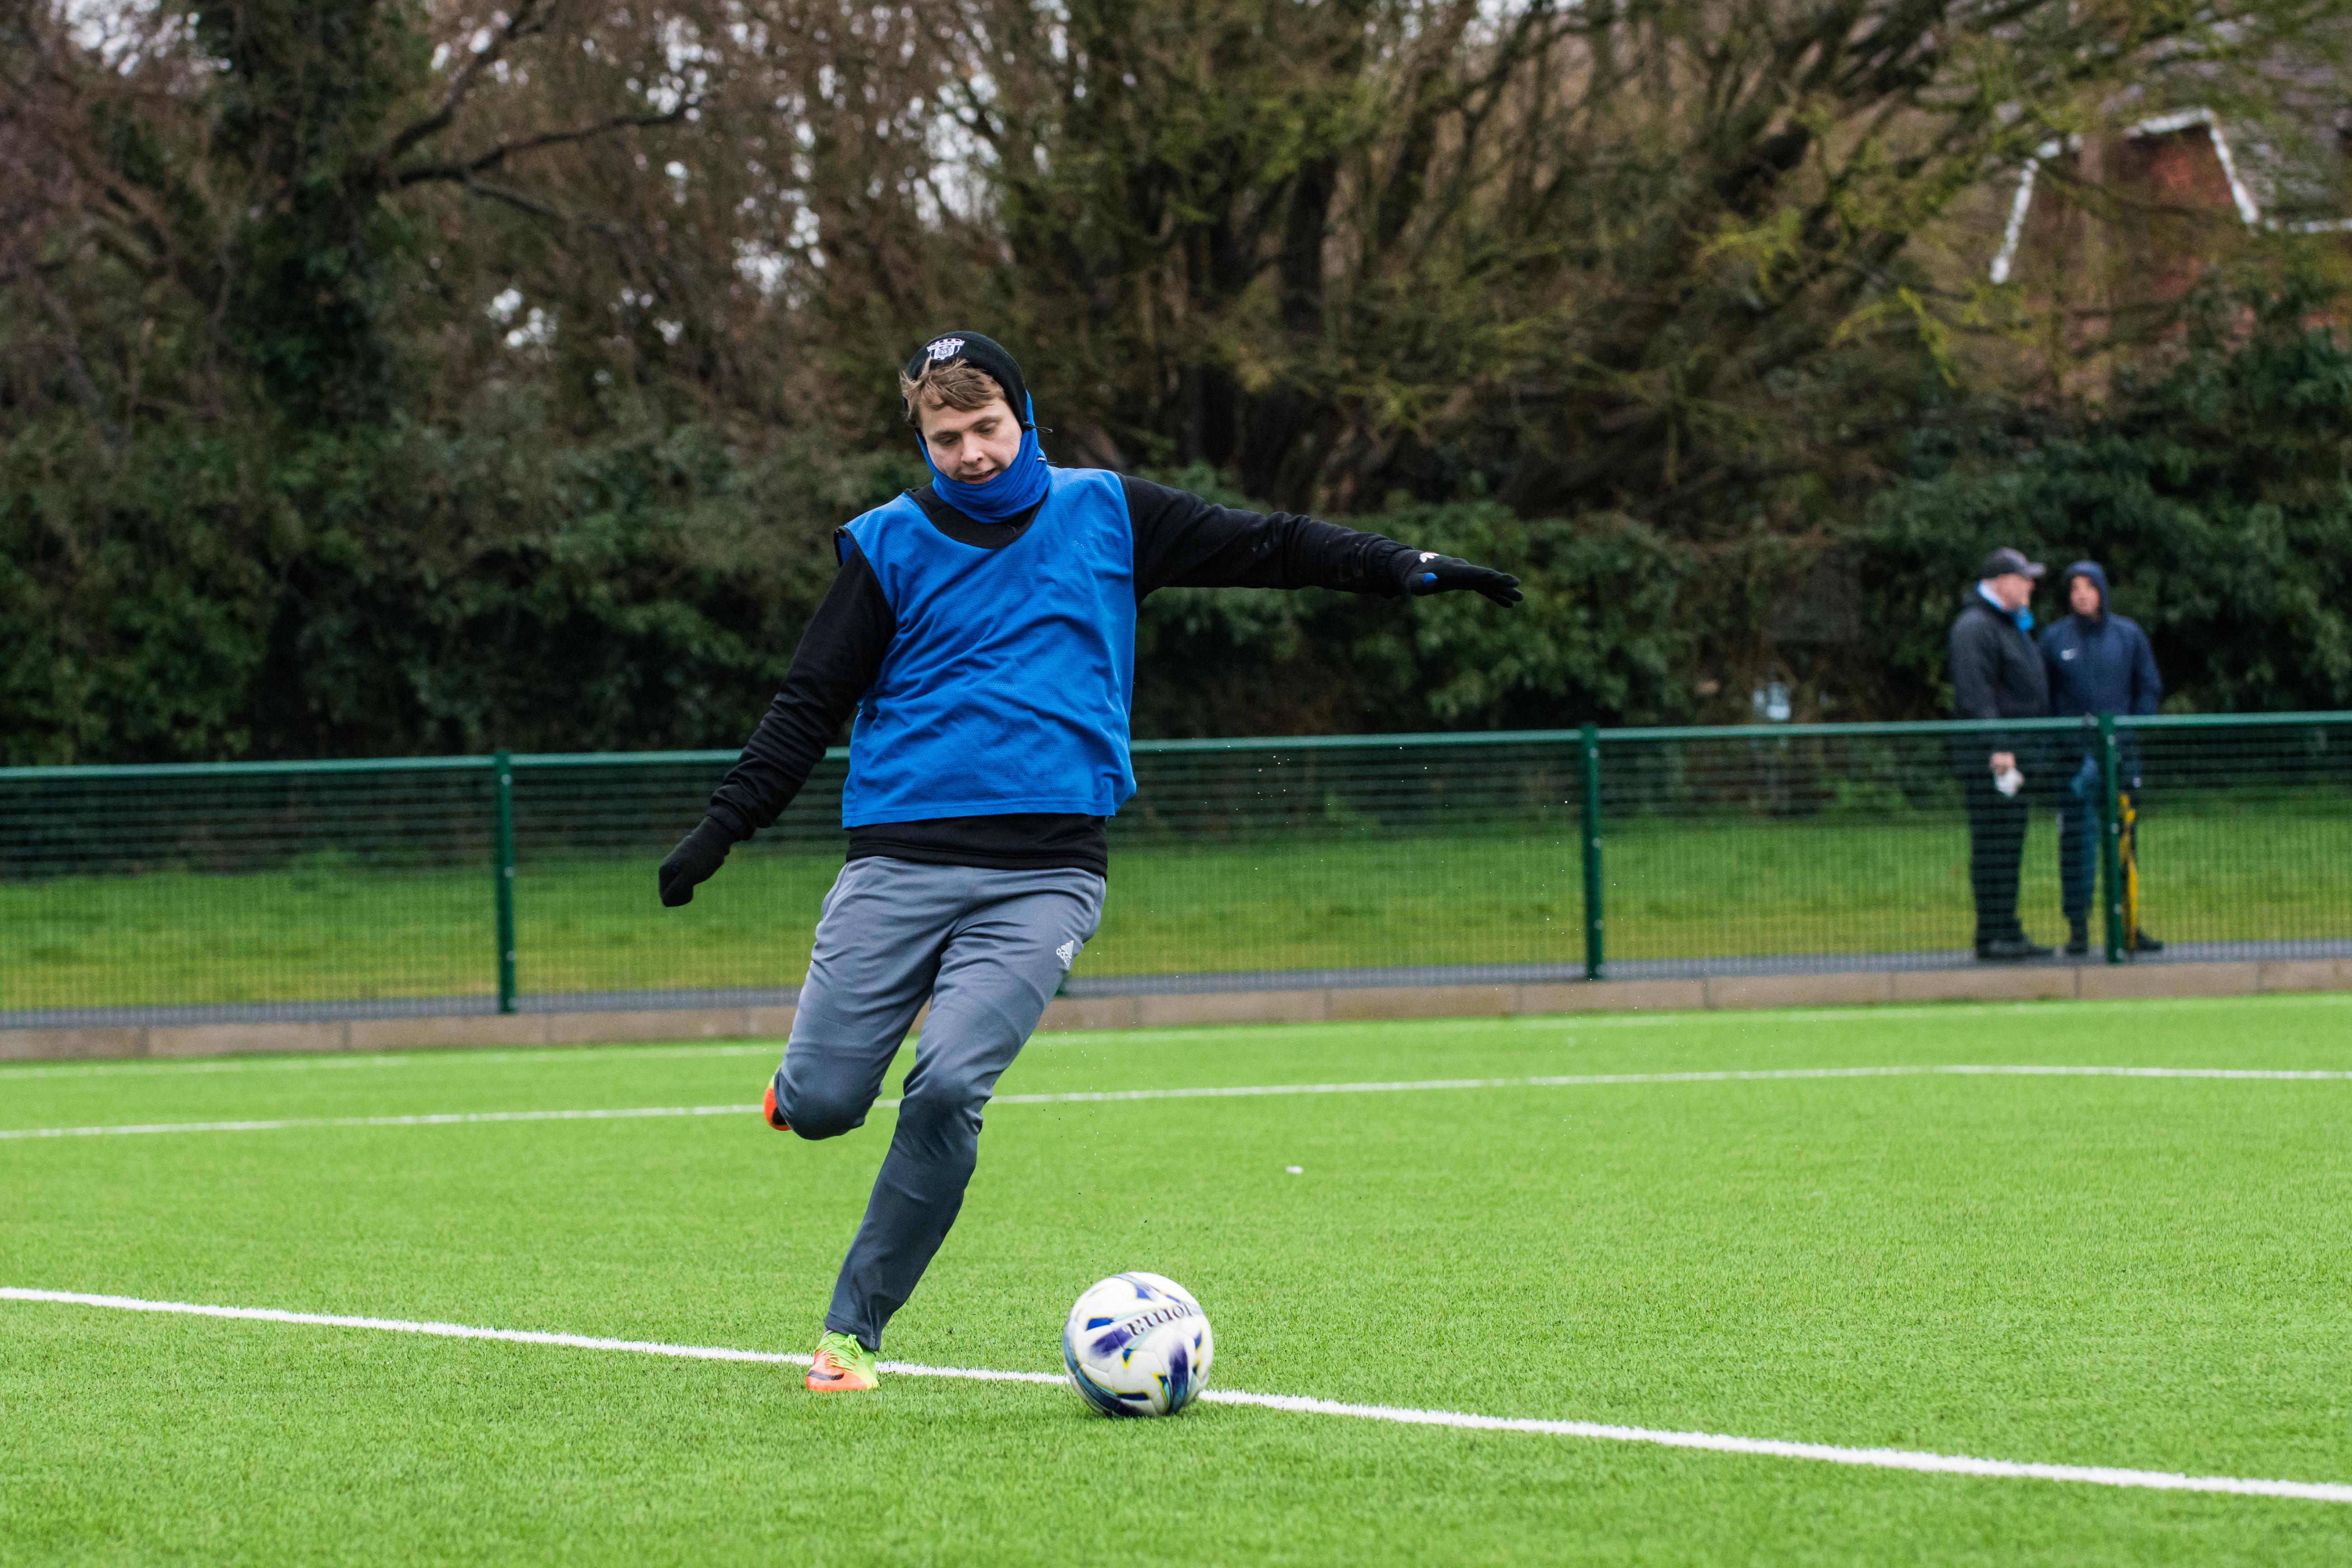 DAVID_JEFFERY Worthing United FC vs East Preston FC 02.04.18 65